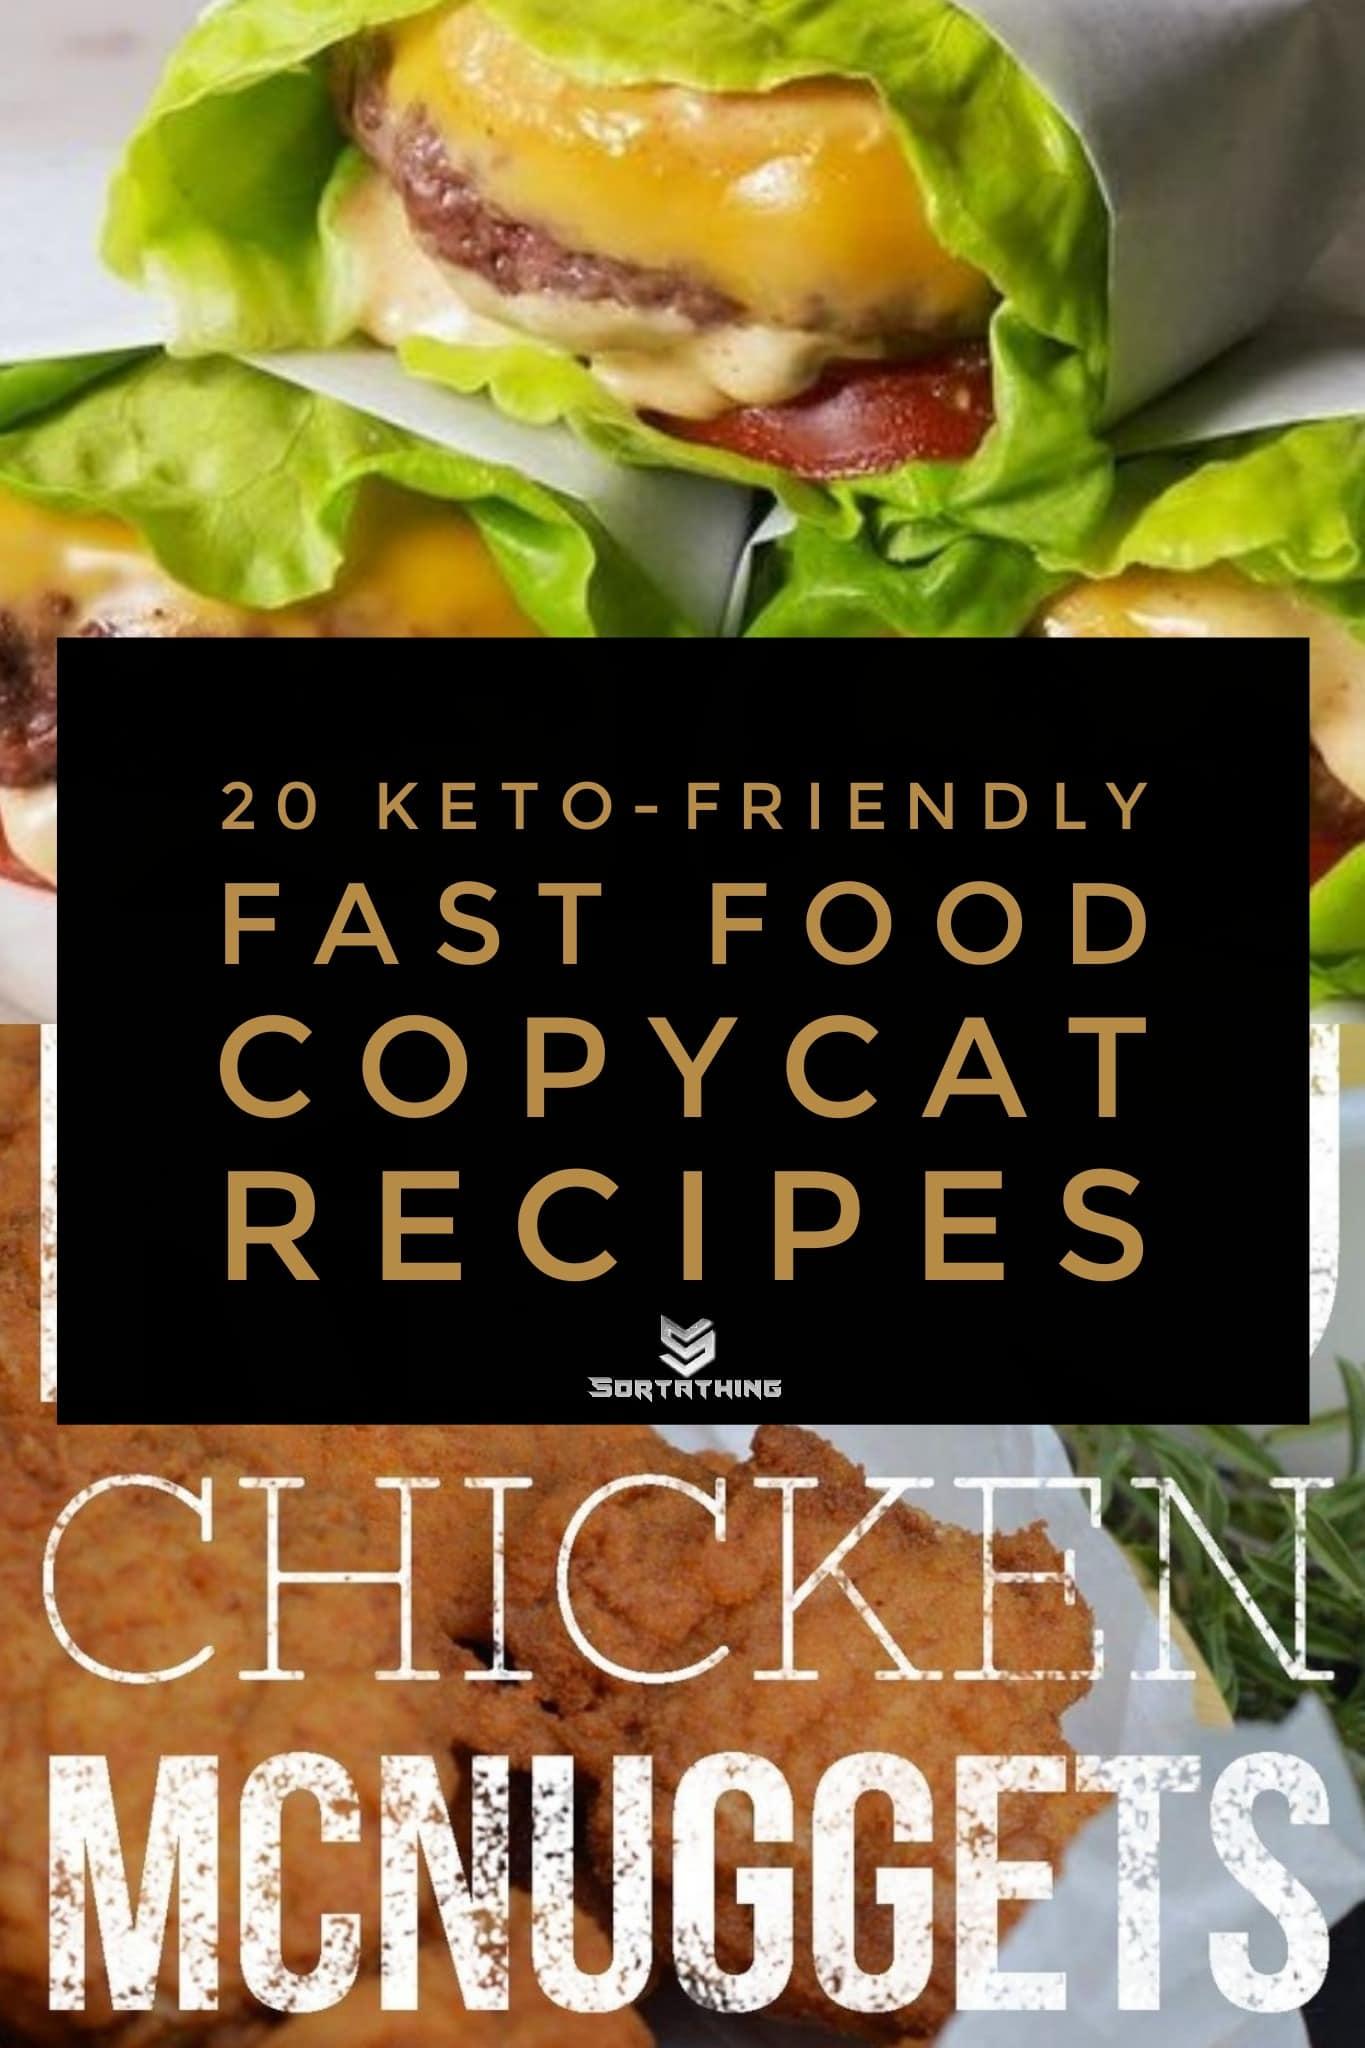 20 Keto-Friendly Fast Food Copycat Recipes Title